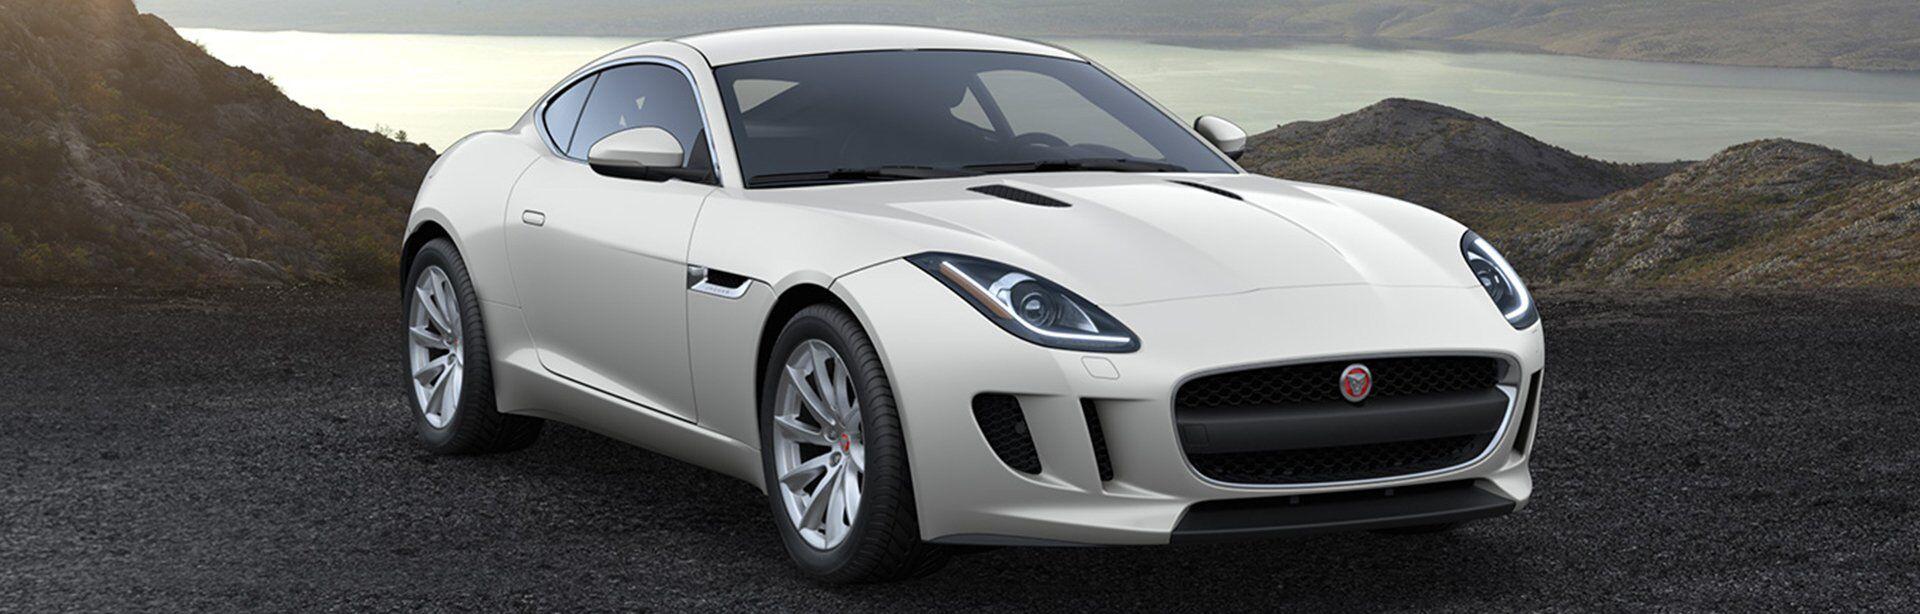 2018 Jaguar F-TYPE Coupe Automatic 380HP